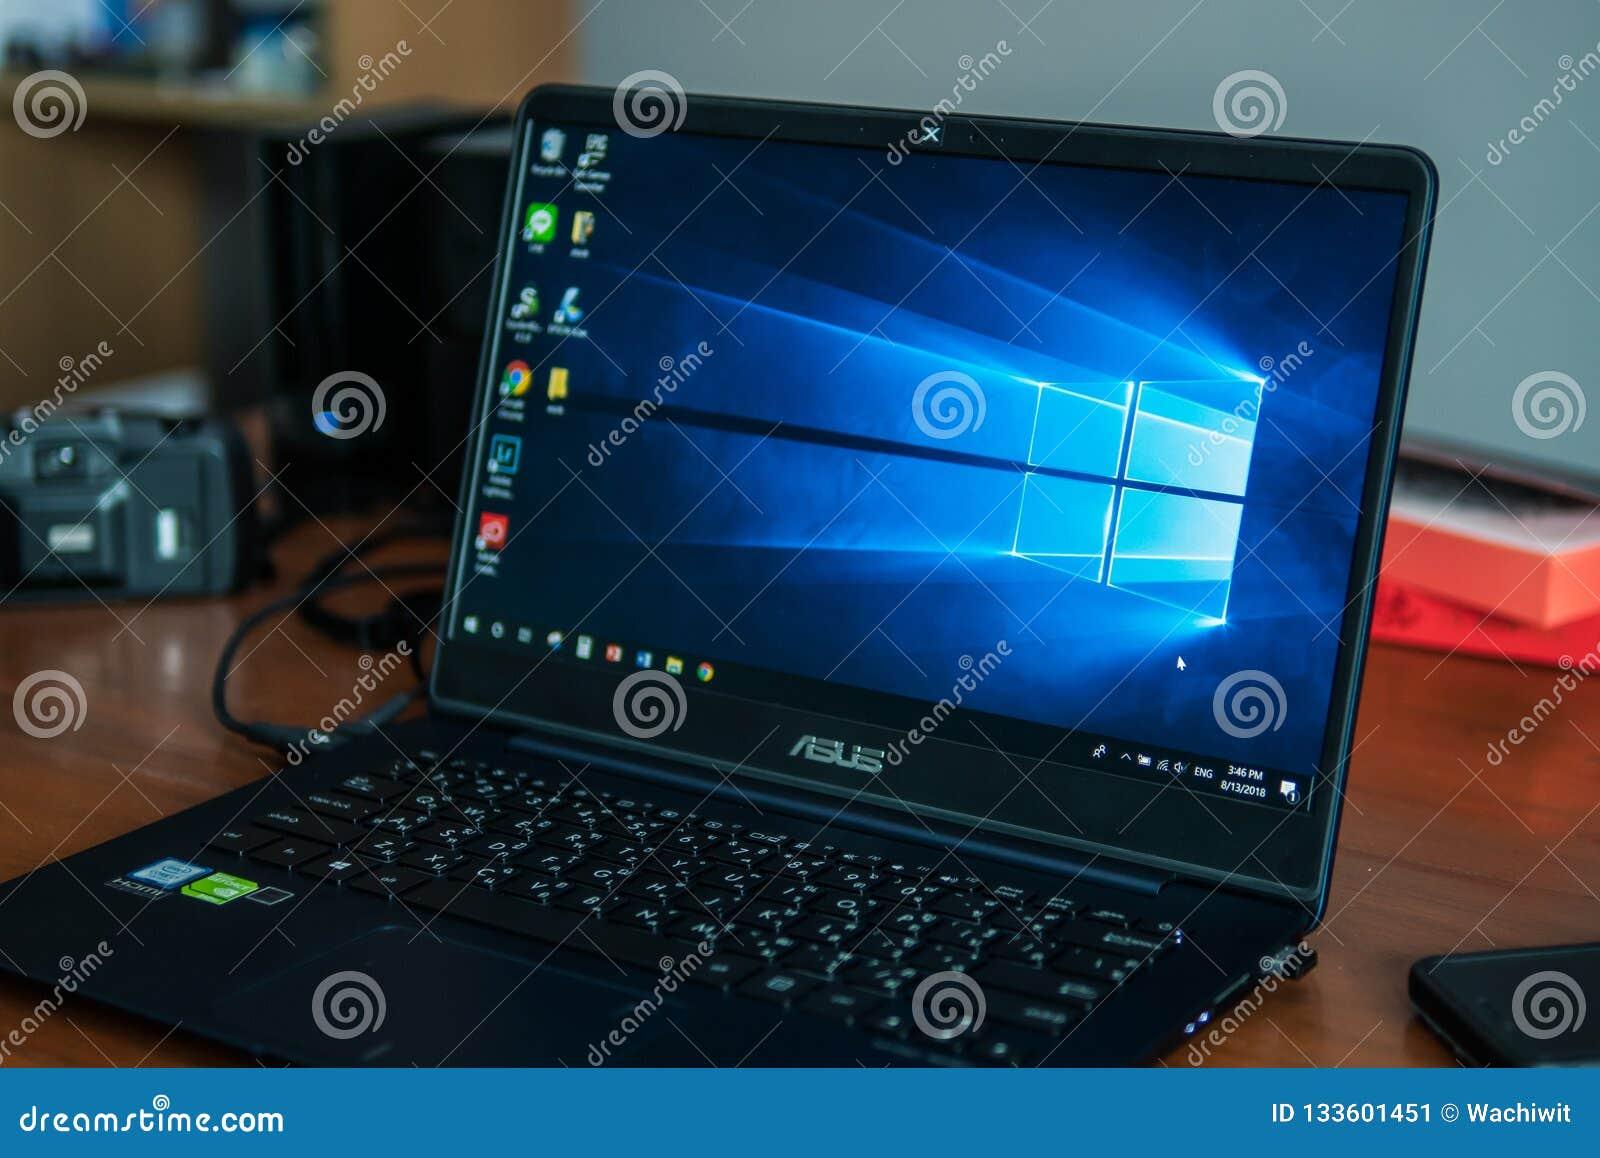 Laptop pokazuje swój ekran z Microsoft Windows logo na desktop